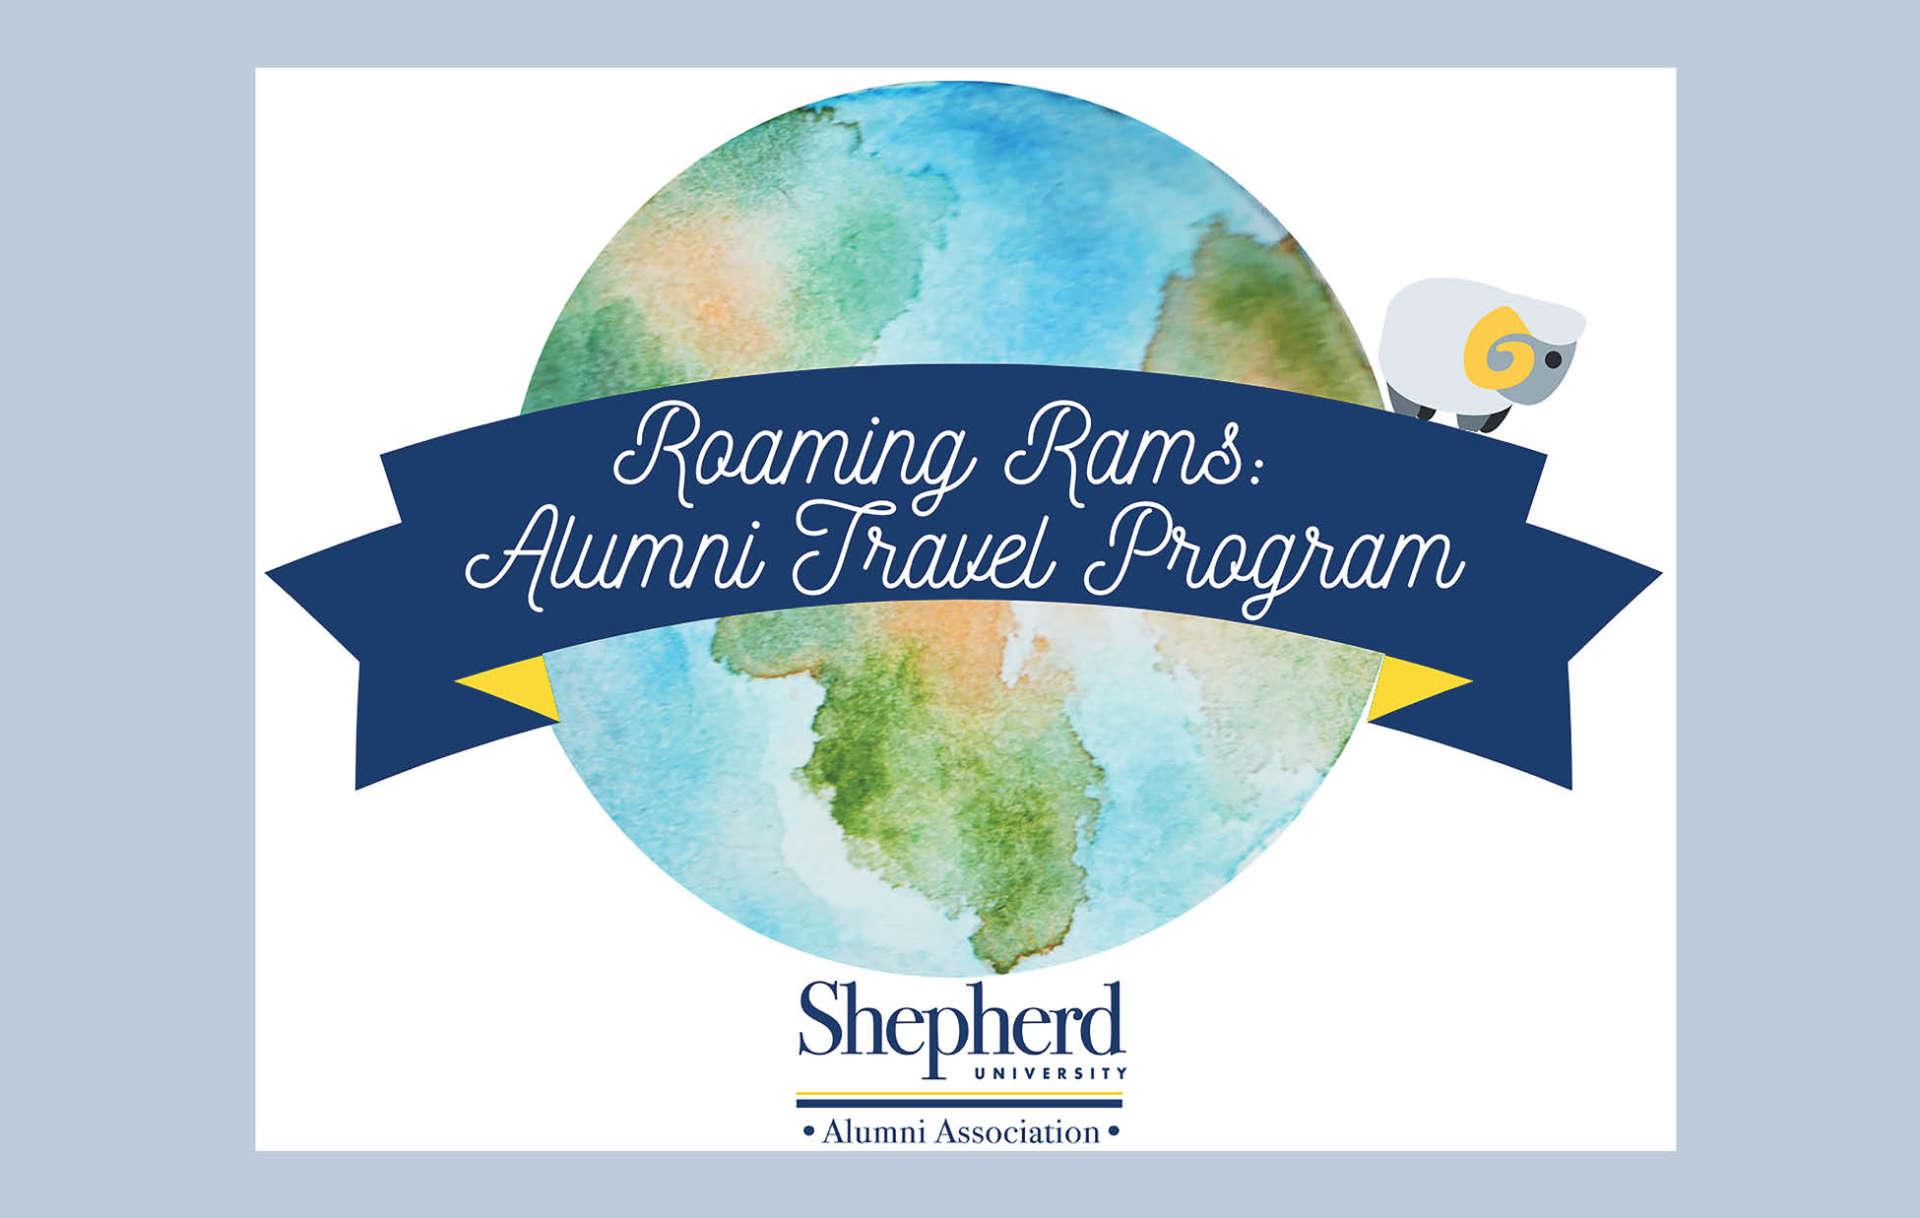 Alumni Association plans next Roaming Rams trip for September